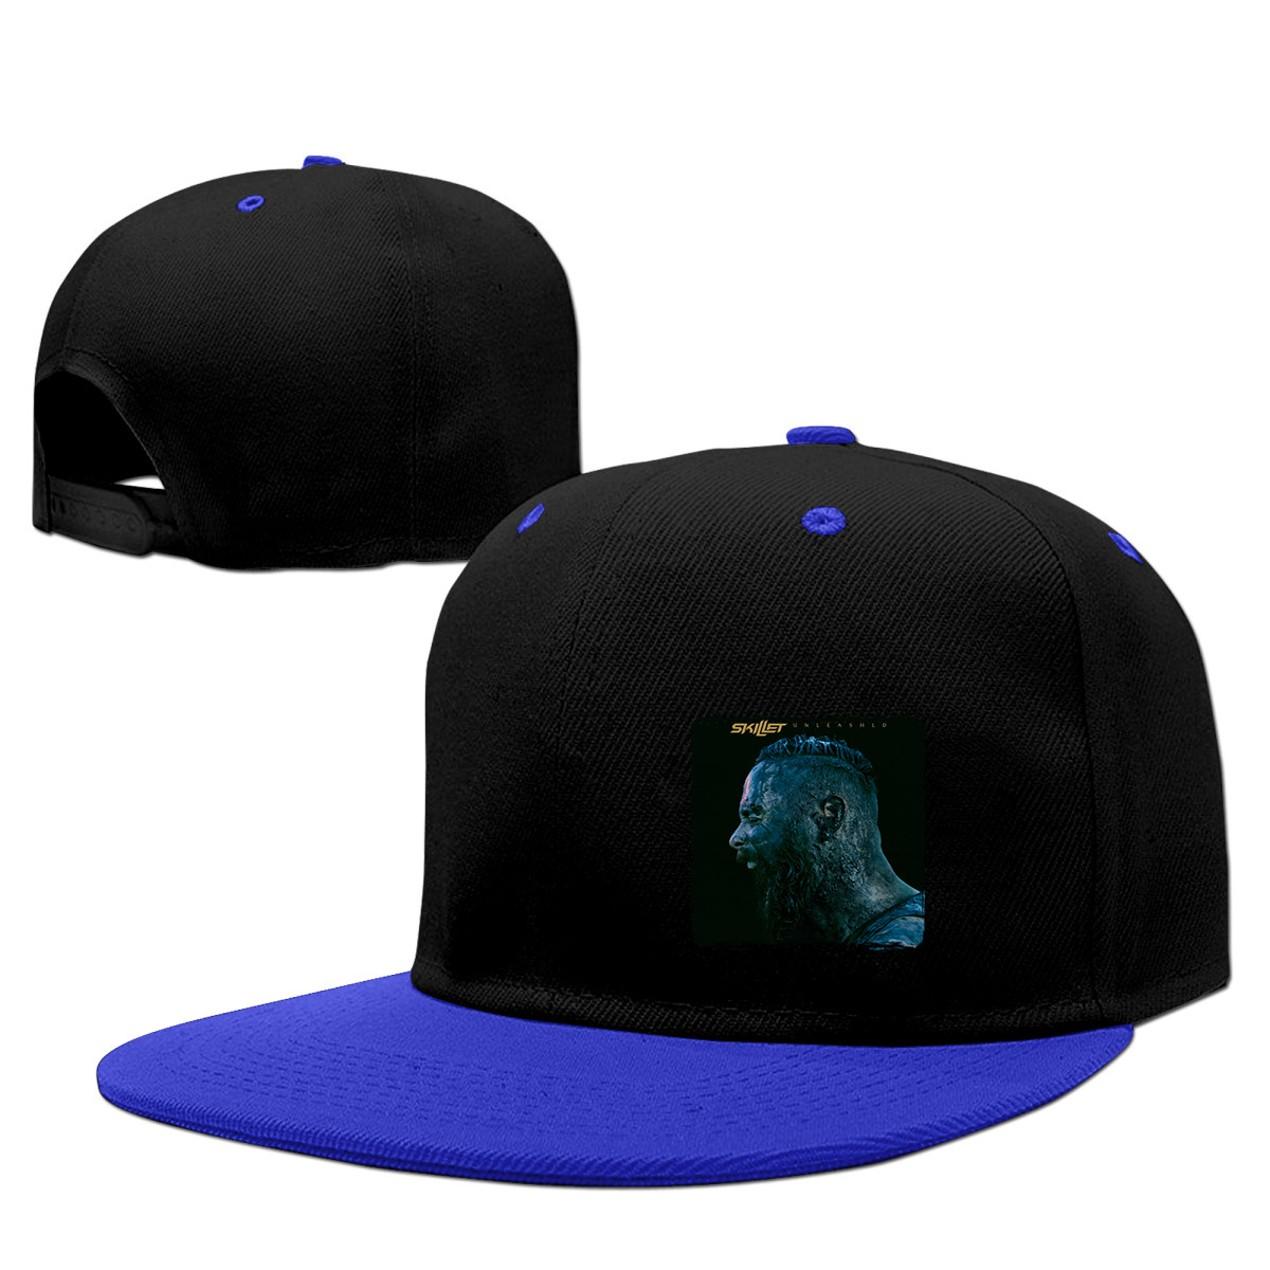 Skillet Unleashed Snapback Baseball Caps Flat Hat - Tanga